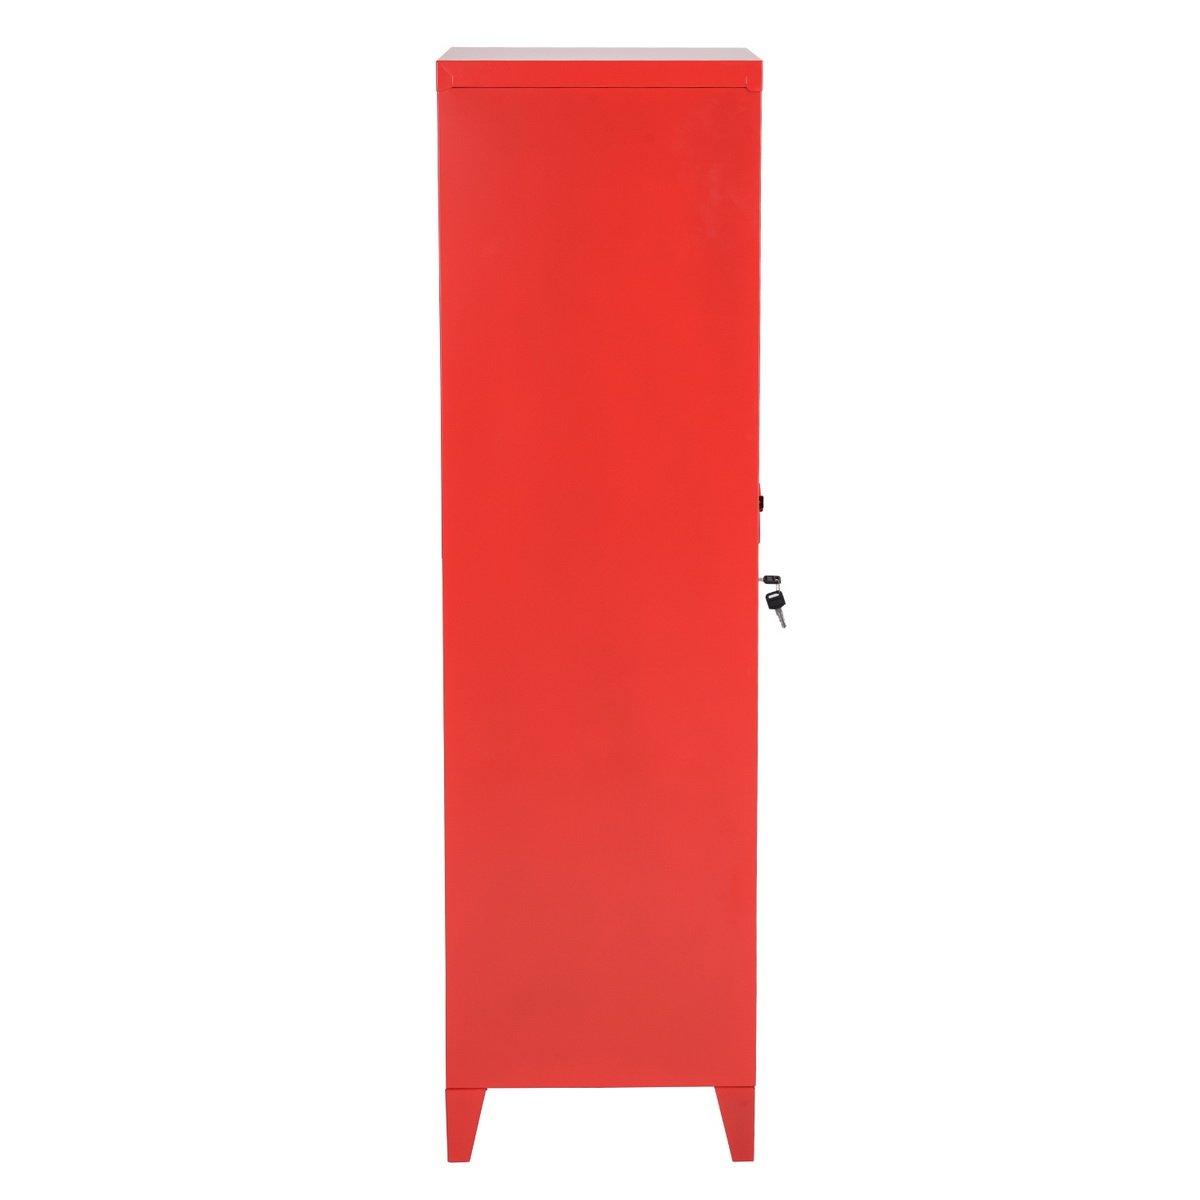 HouseinBox Office File Storage Metal Cabinet 3 Door Cupboard Locker Organizer Console Stand 3-in-1 (RED-Standing Locker) by HouseinBox (Image #9)